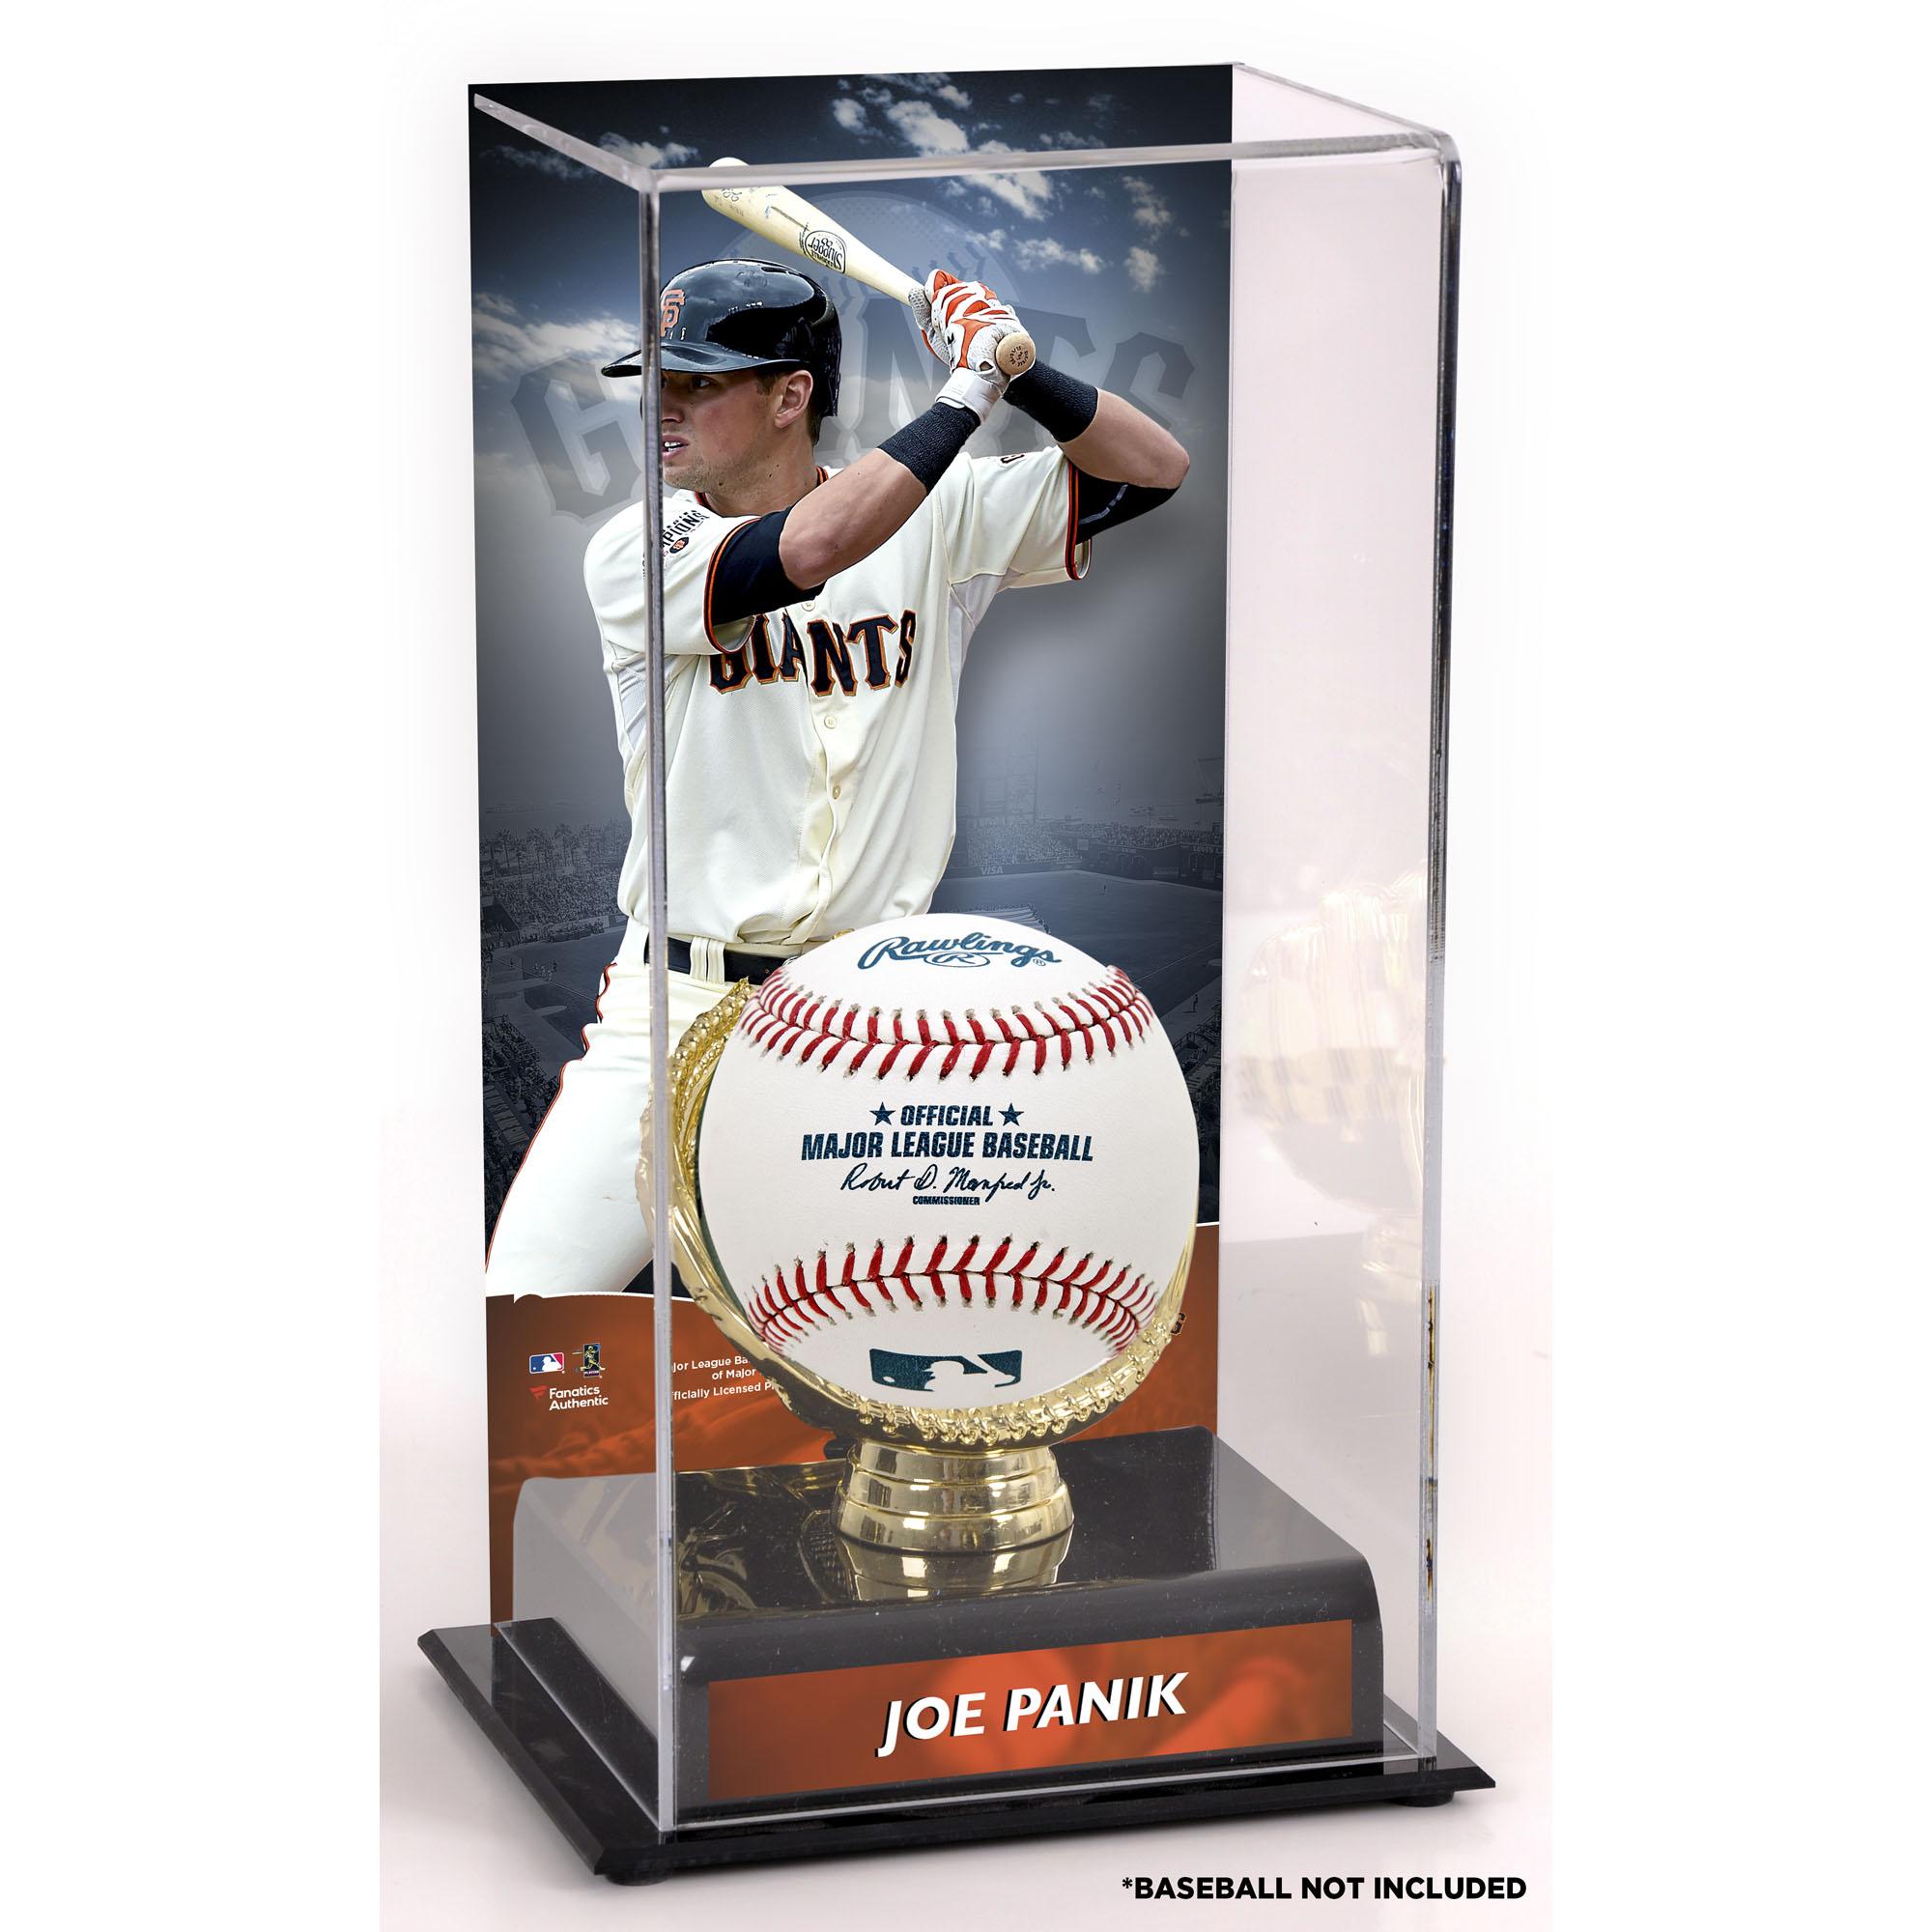 Joe Panik San Francisco Giants Fanatics Authentic Gold Glove Display Case with Image - No Size